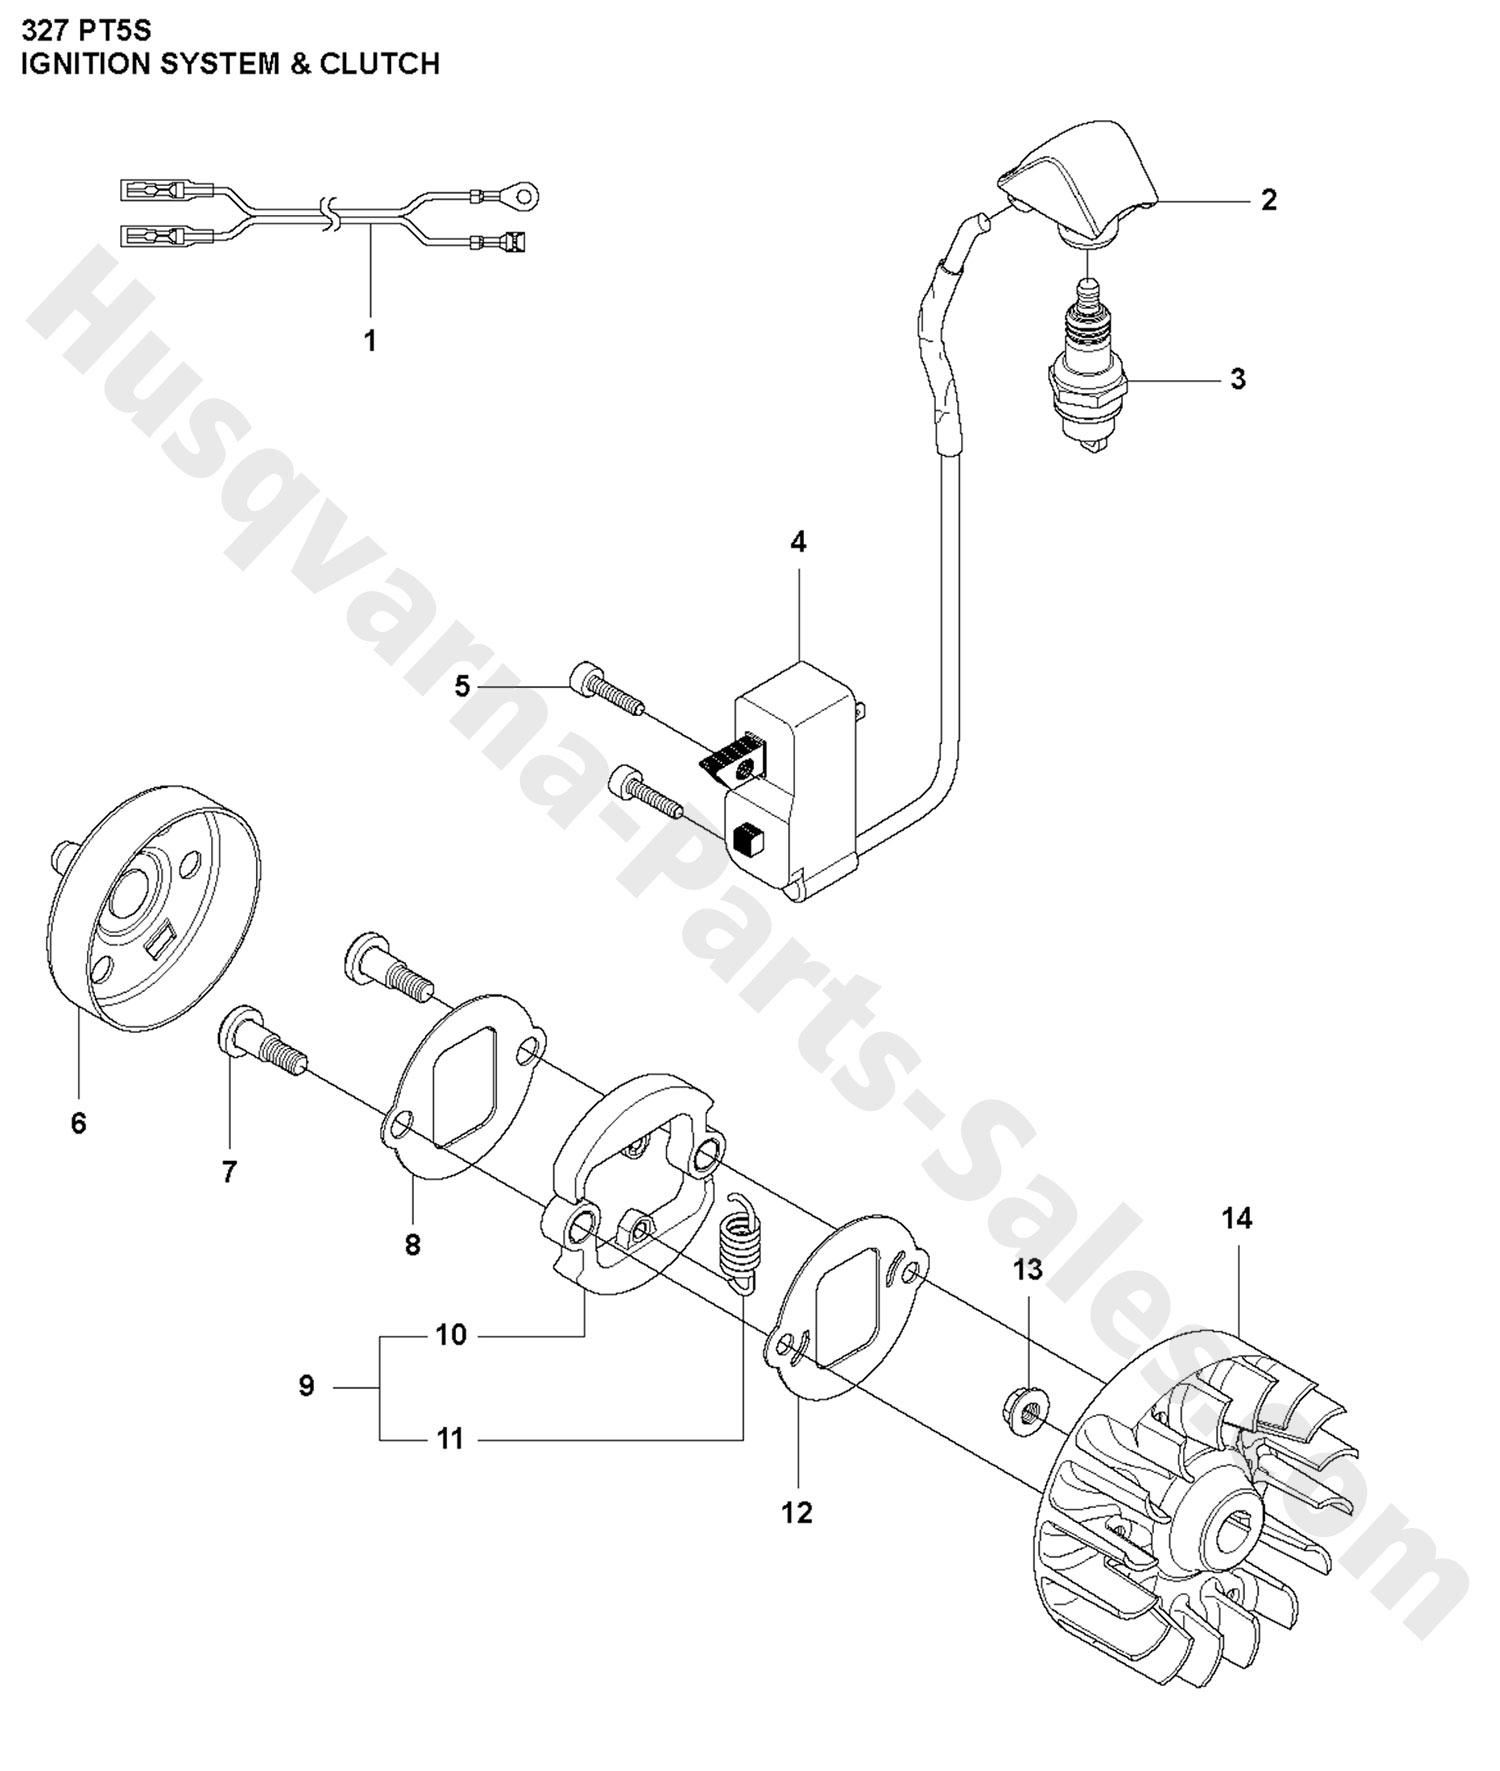 327pt5s husqvarna pole saw ignition system  u0026 clutch parts